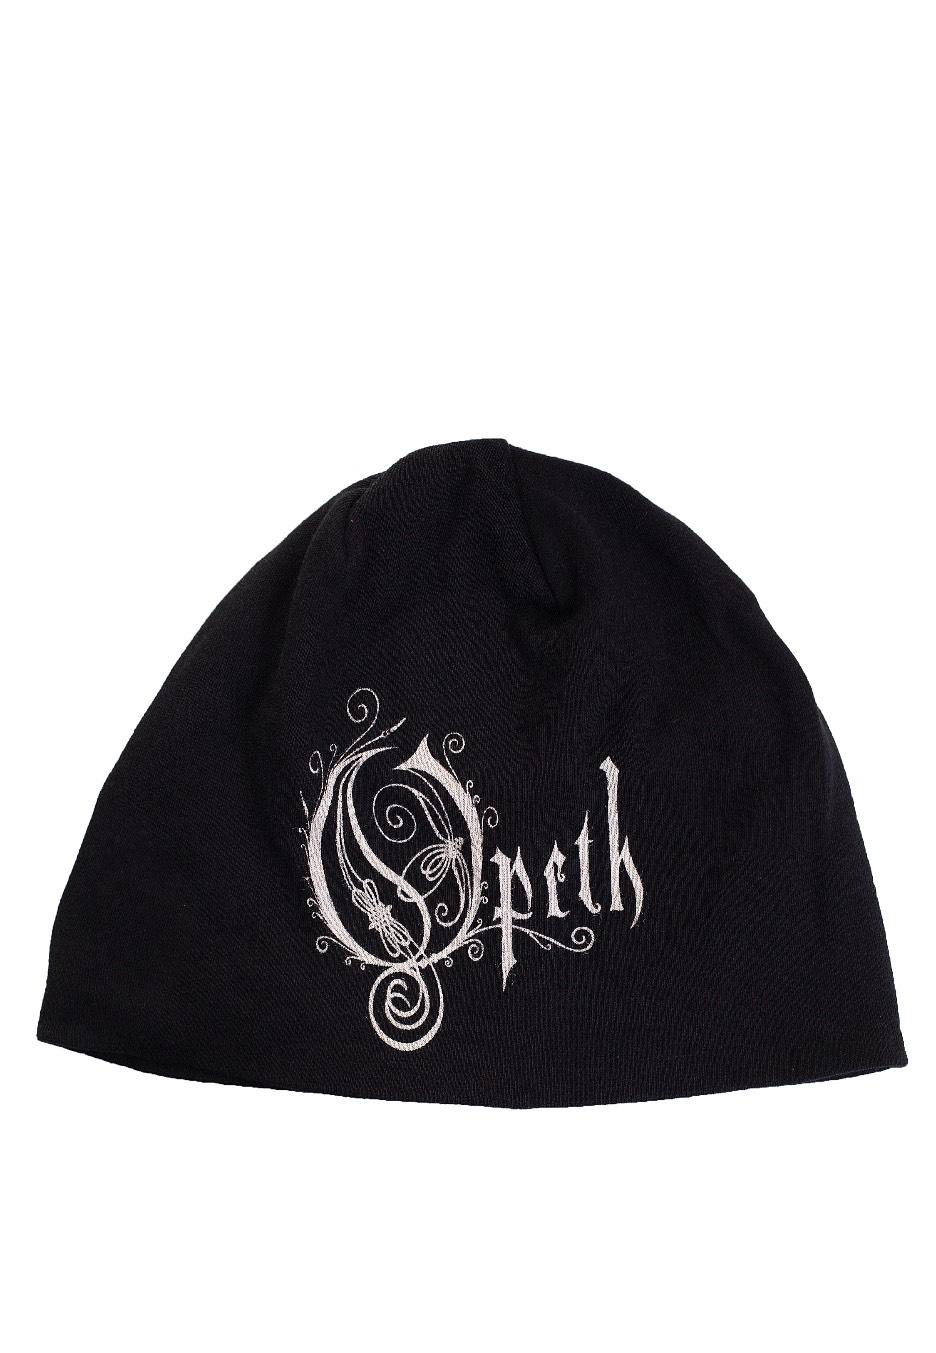 Opeth - Logo - Beanies